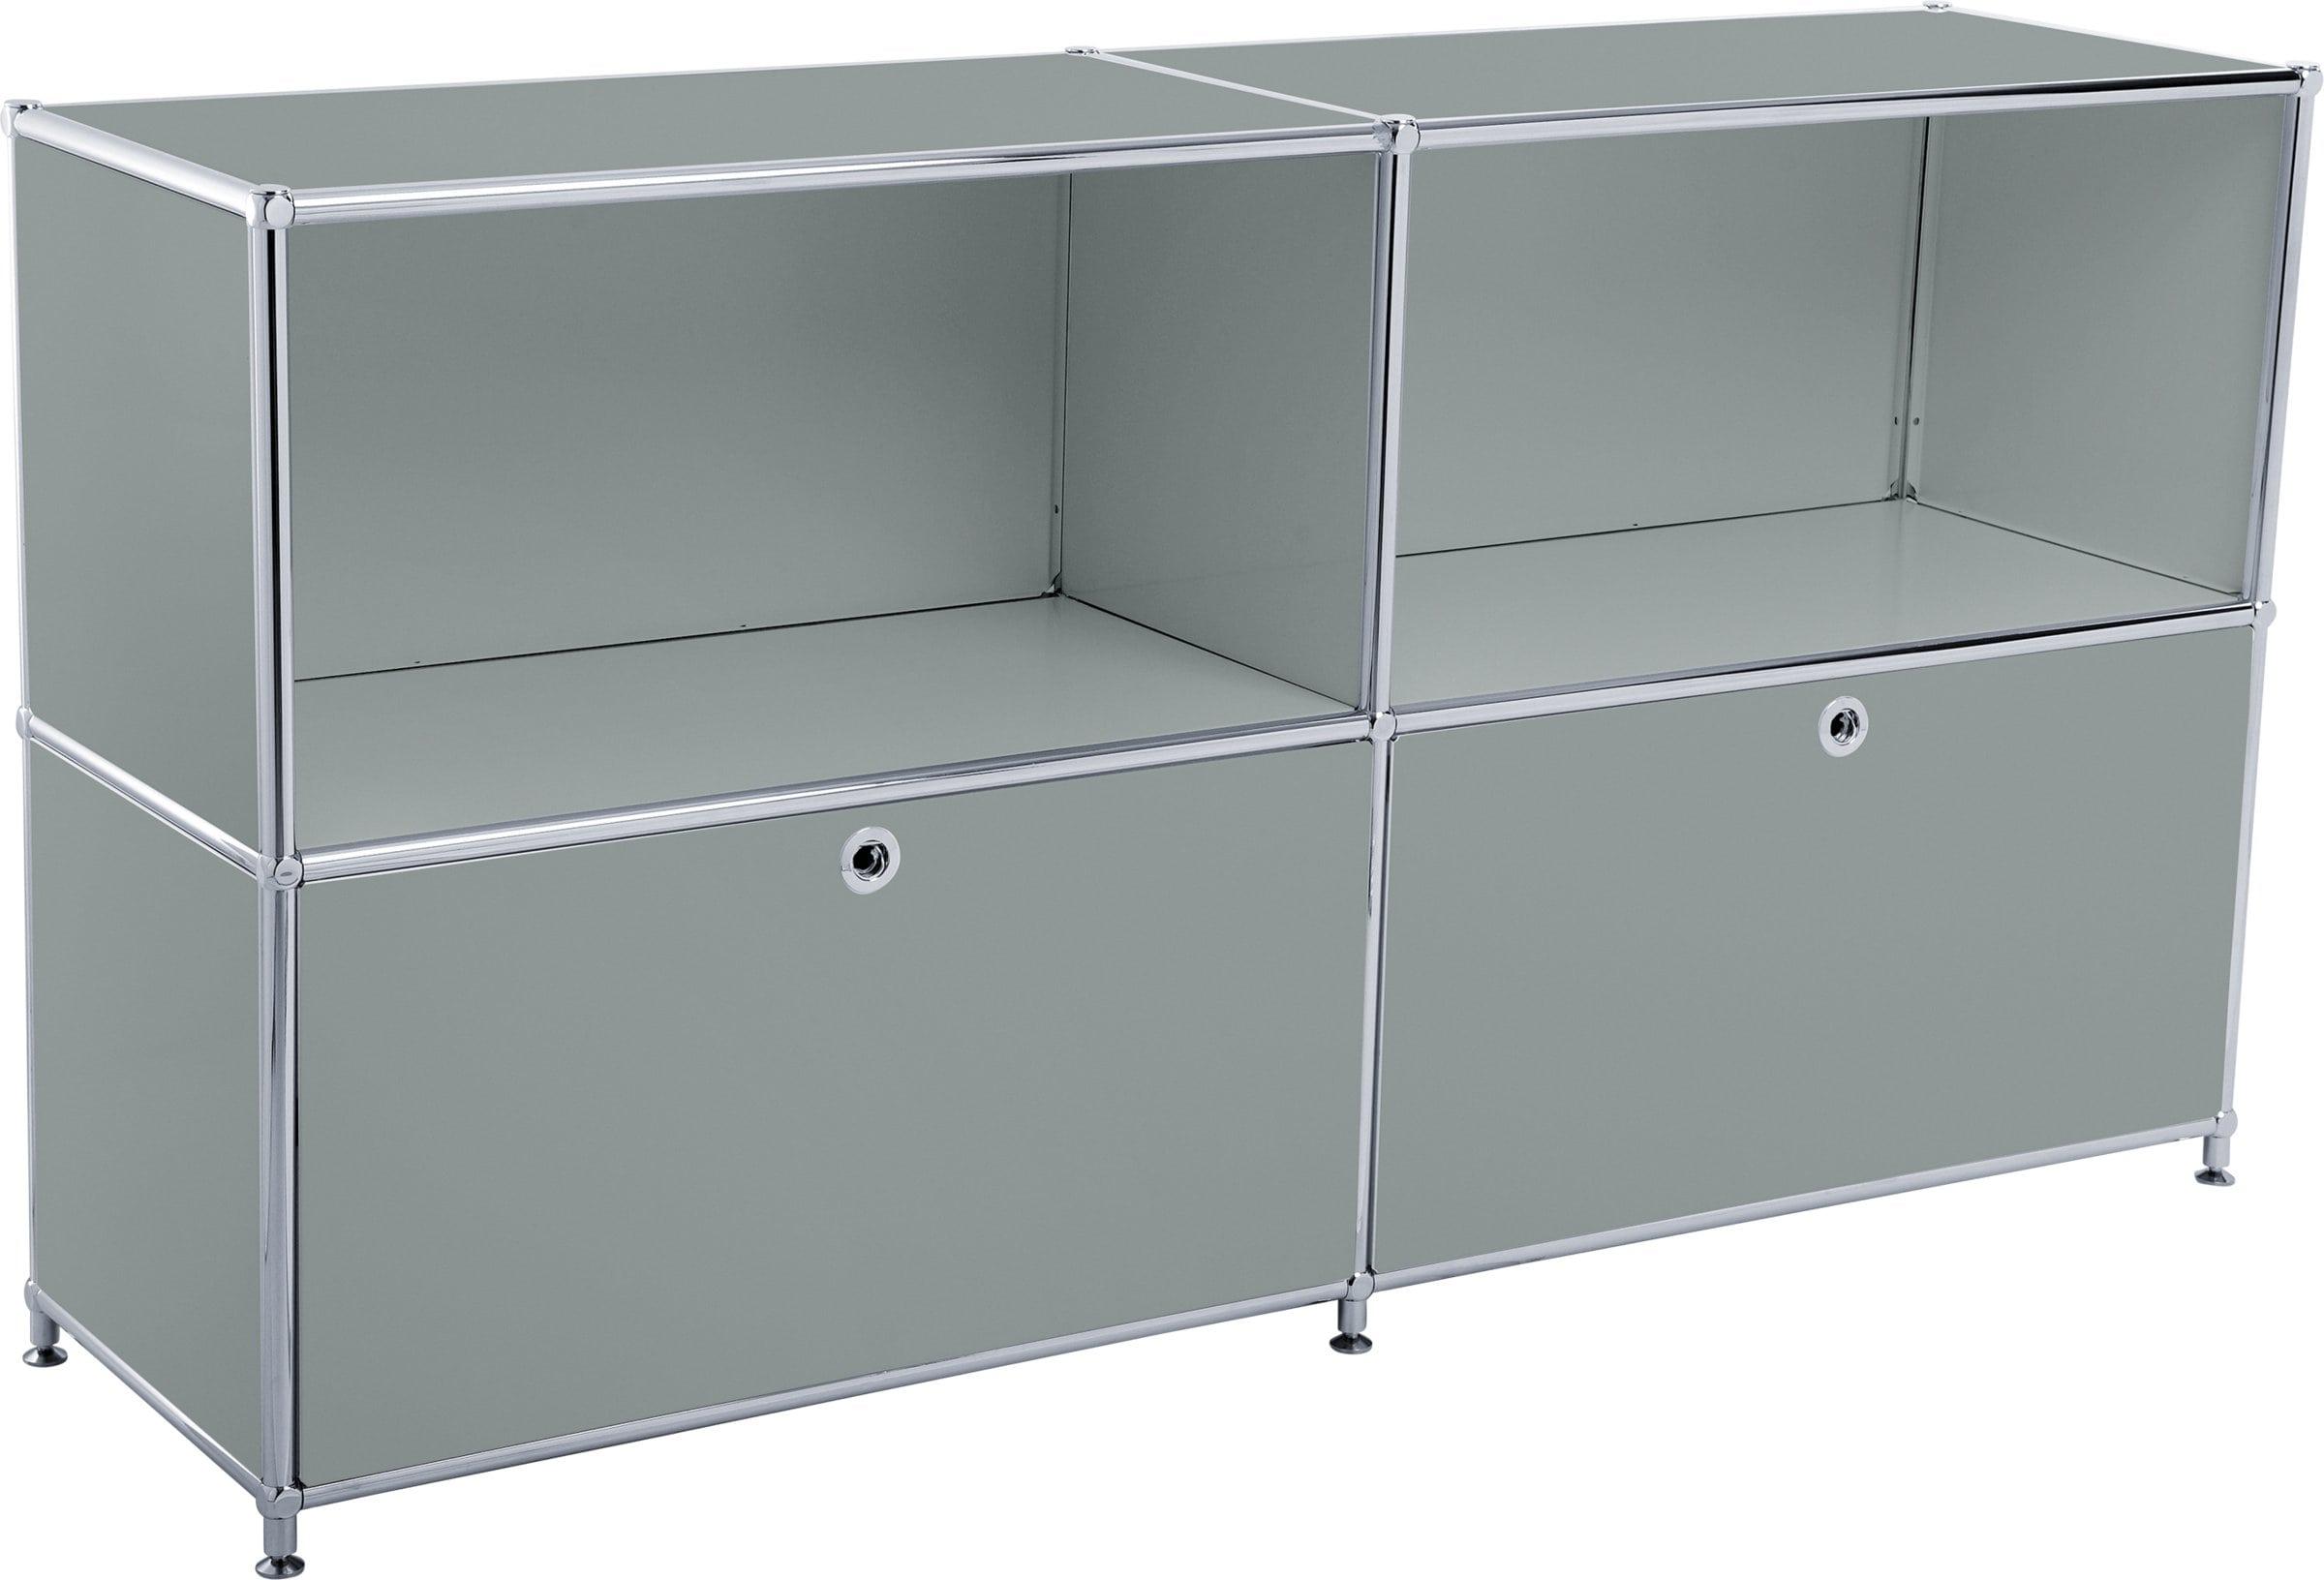 flexcube sideboard migipedia. Black Bedroom Furniture Sets. Home Design Ideas